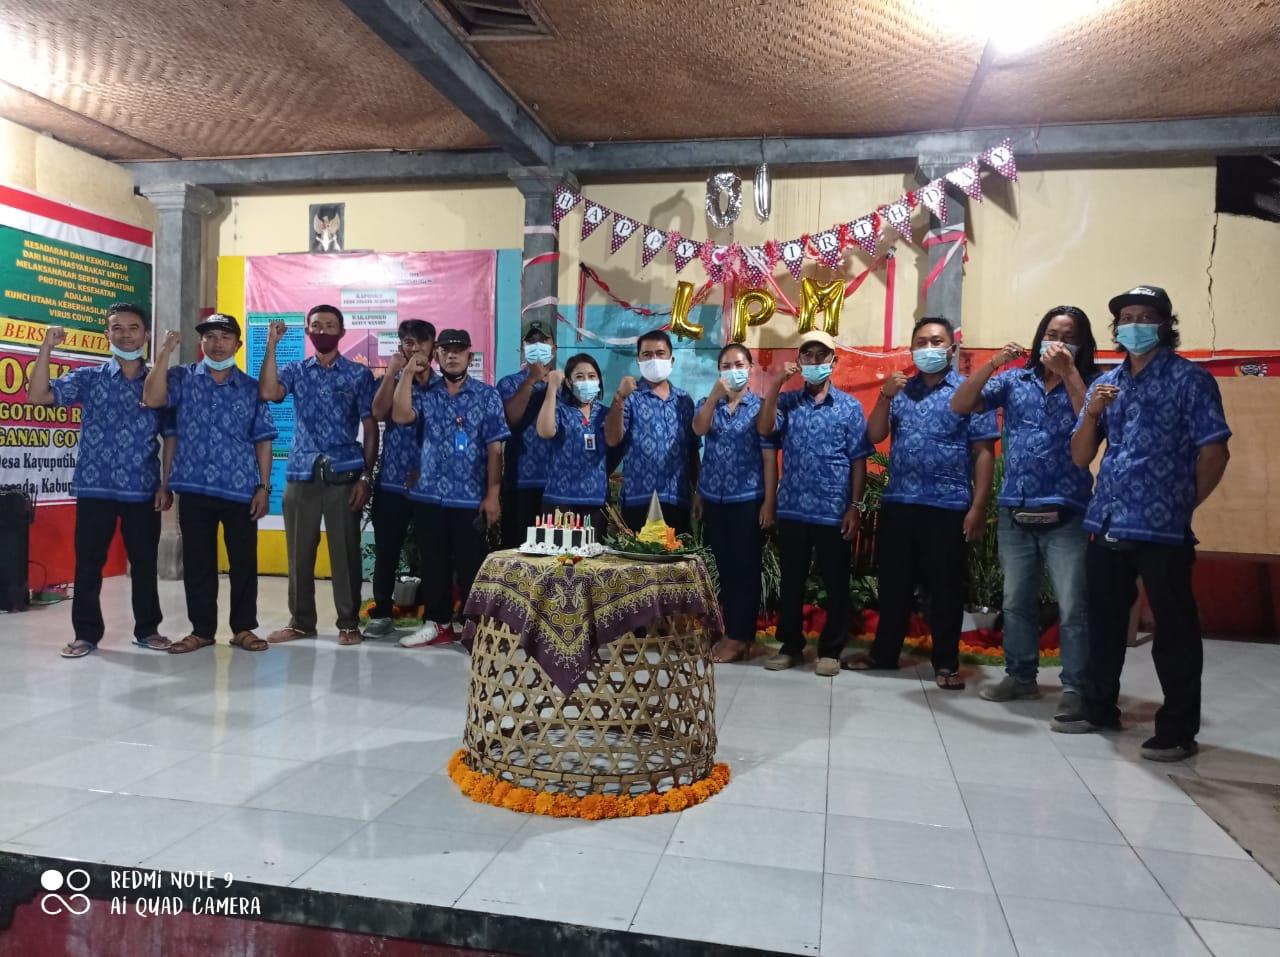 LPM Kayuputih Berbagi Sembako Bersama Donatur untuk Lansia Sambut HUT